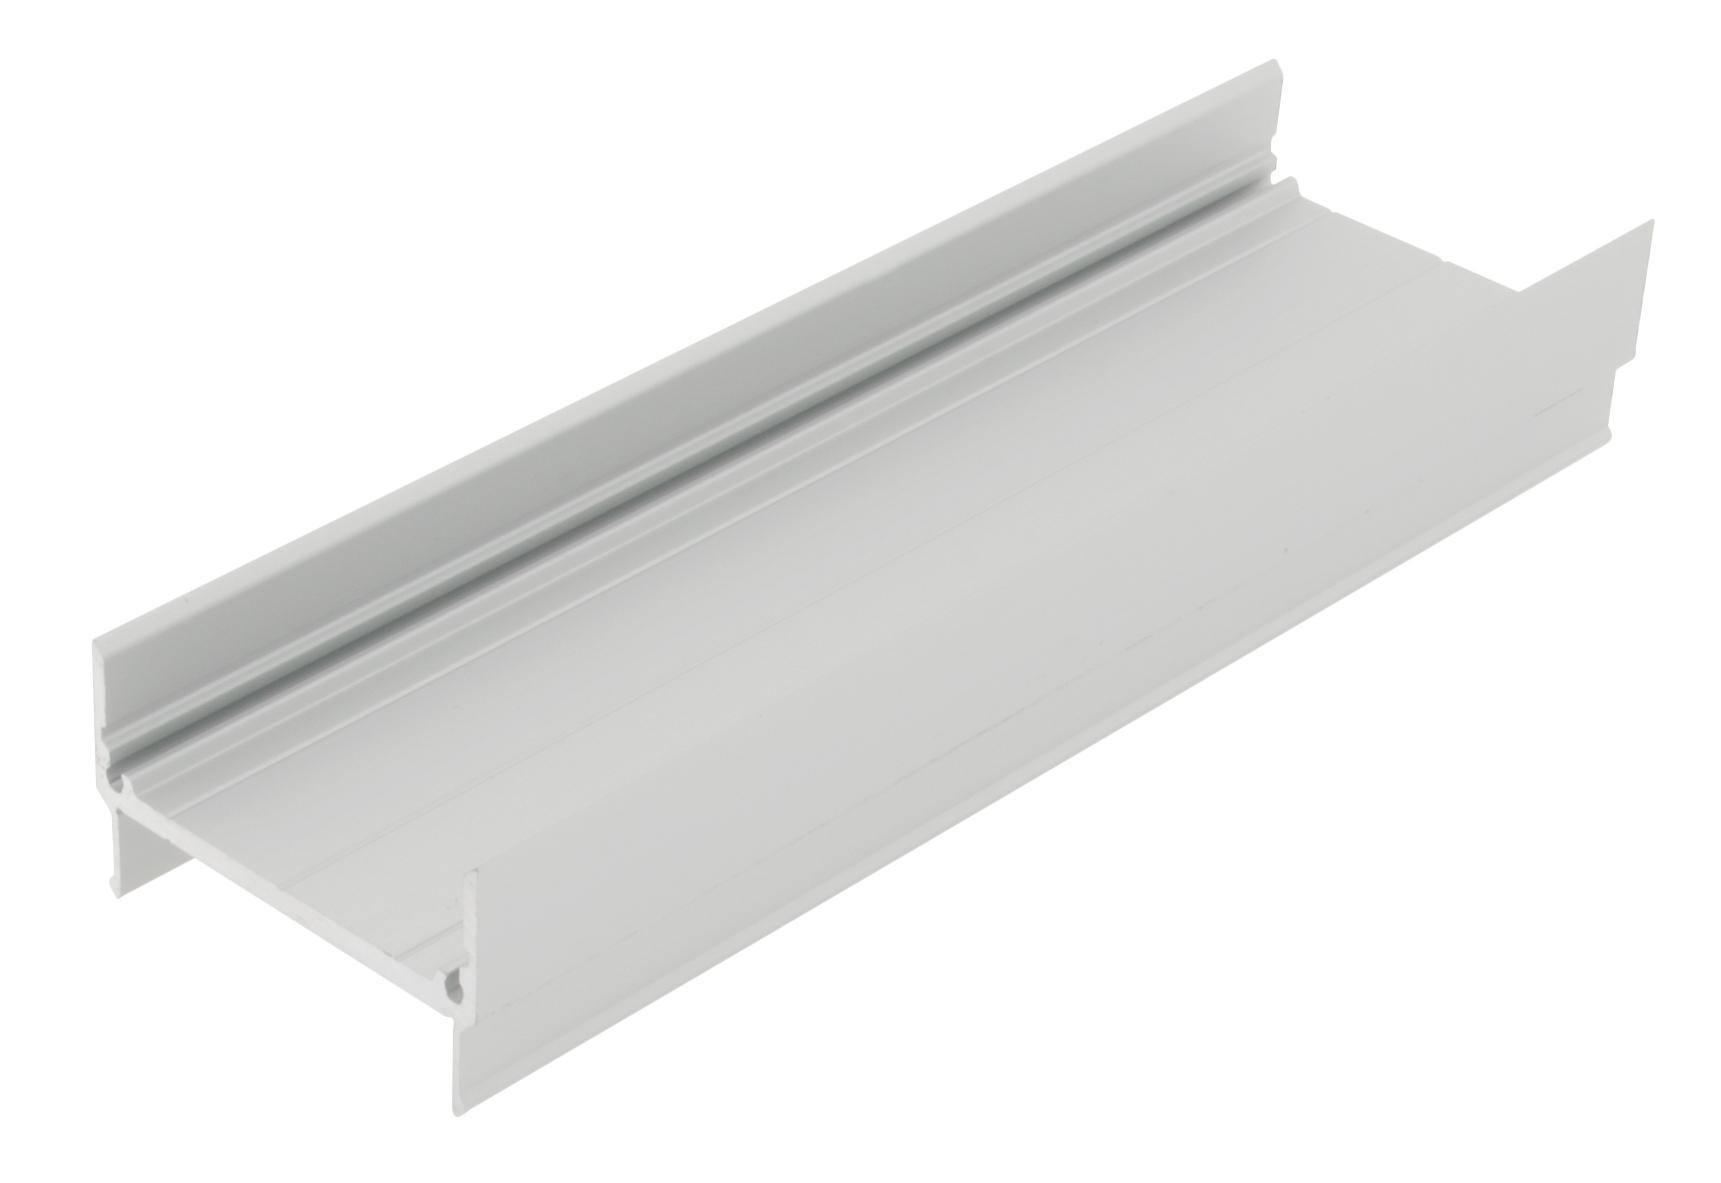 1 m Aluminium Profil MFS, 2m LIAP005006